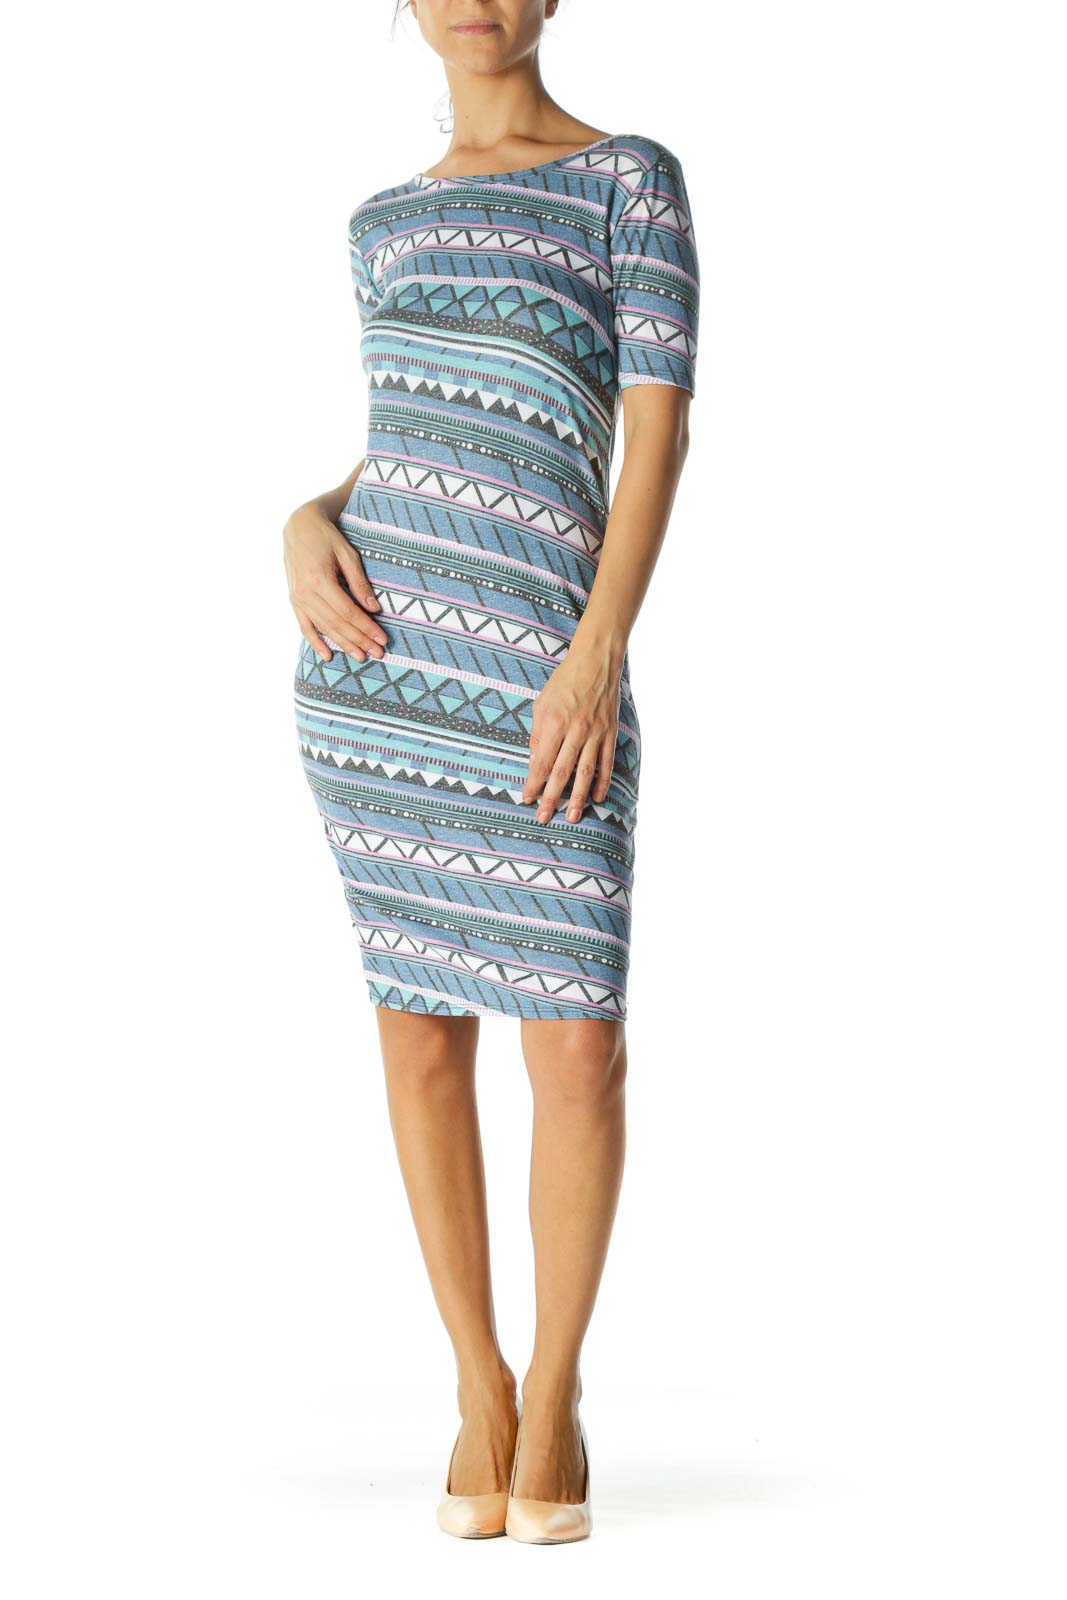 Blue Color Patterned Fit Dress